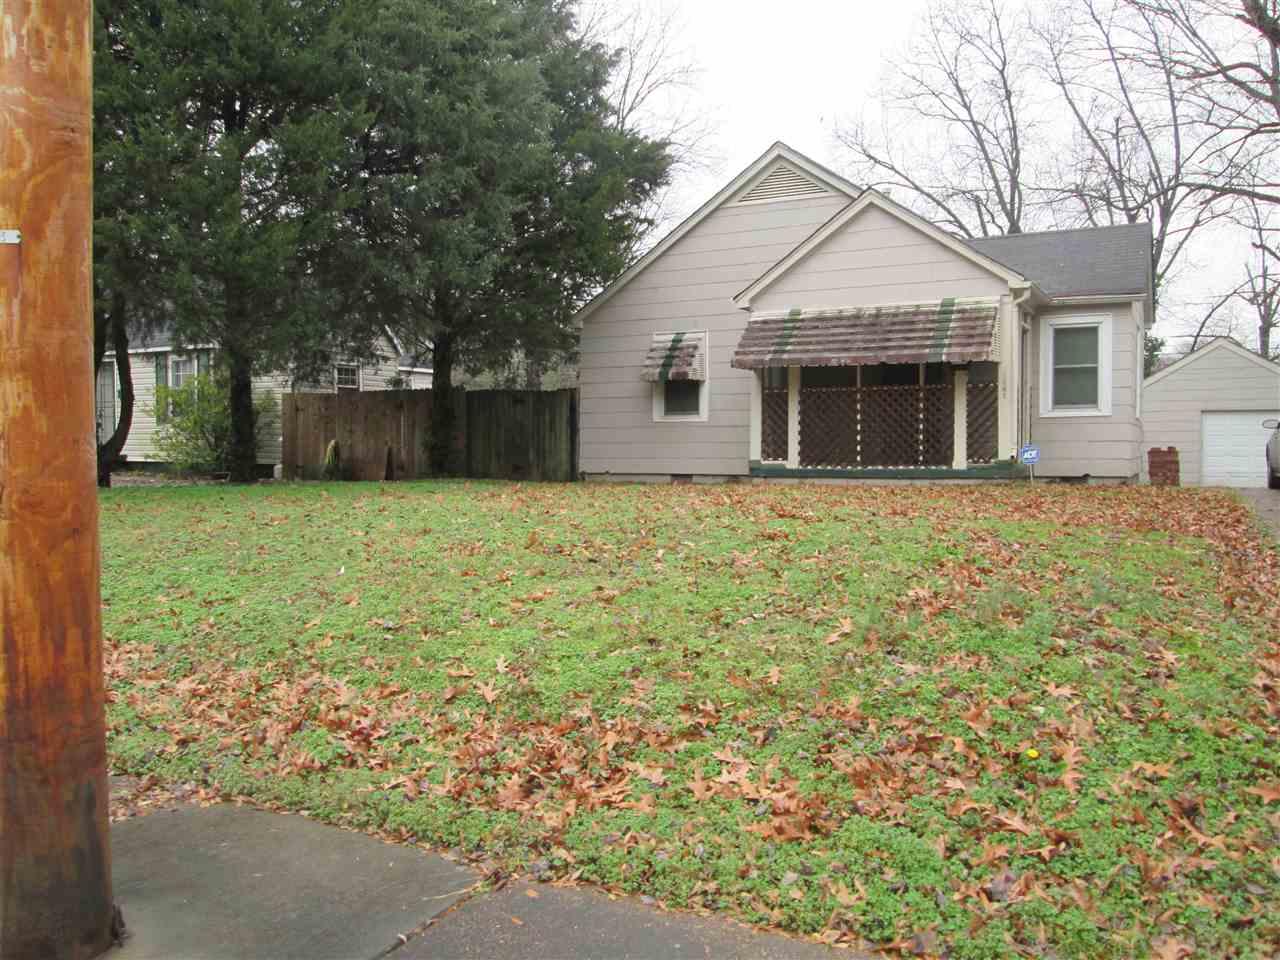 1062 W Walthal St, Memphis, TN